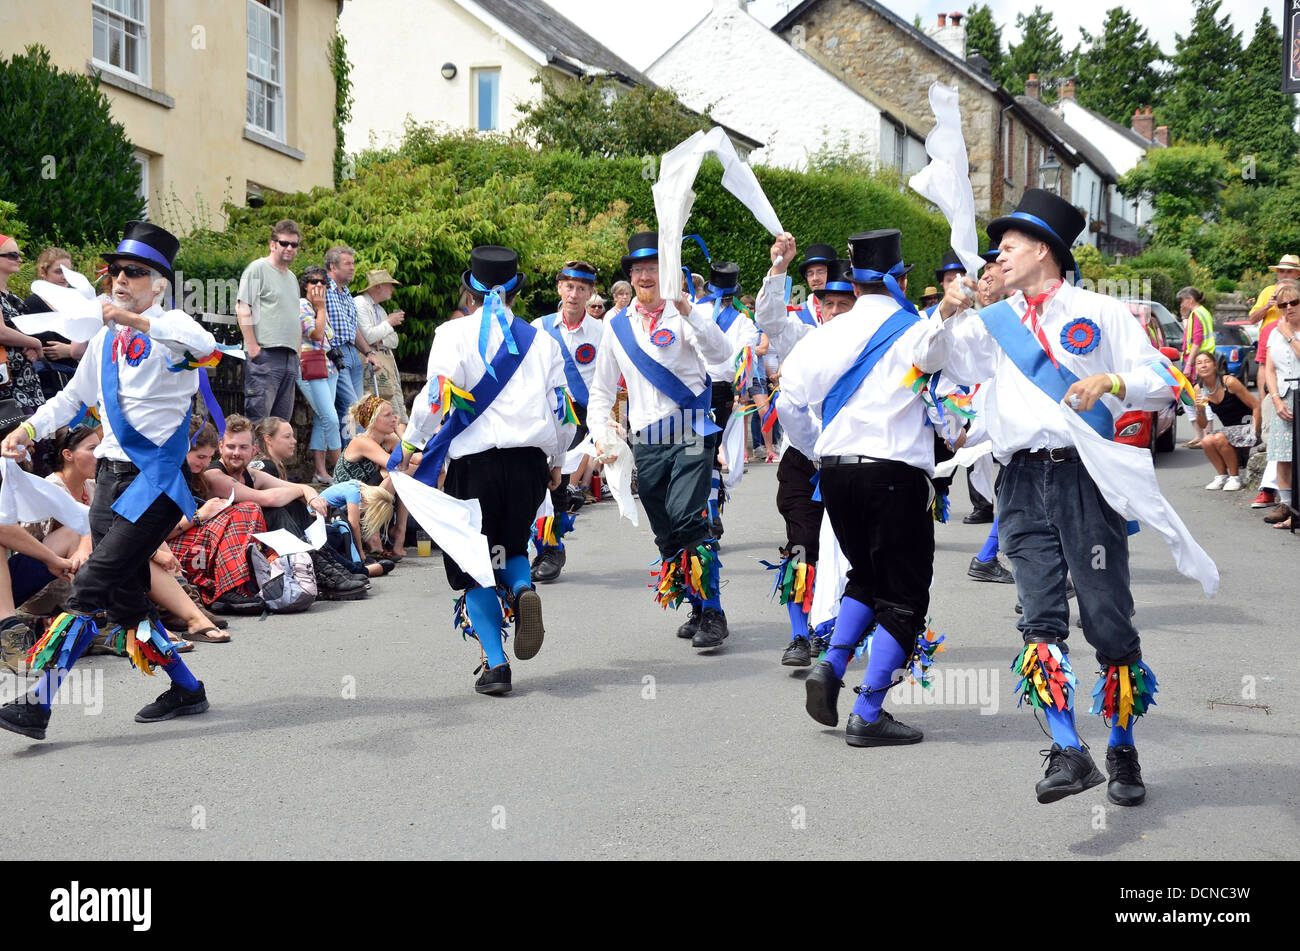 Morris Dancers at the 2013 Dartmoor Folk Festival, South Zeal, Dartmoor, Devon, England - Stock Image